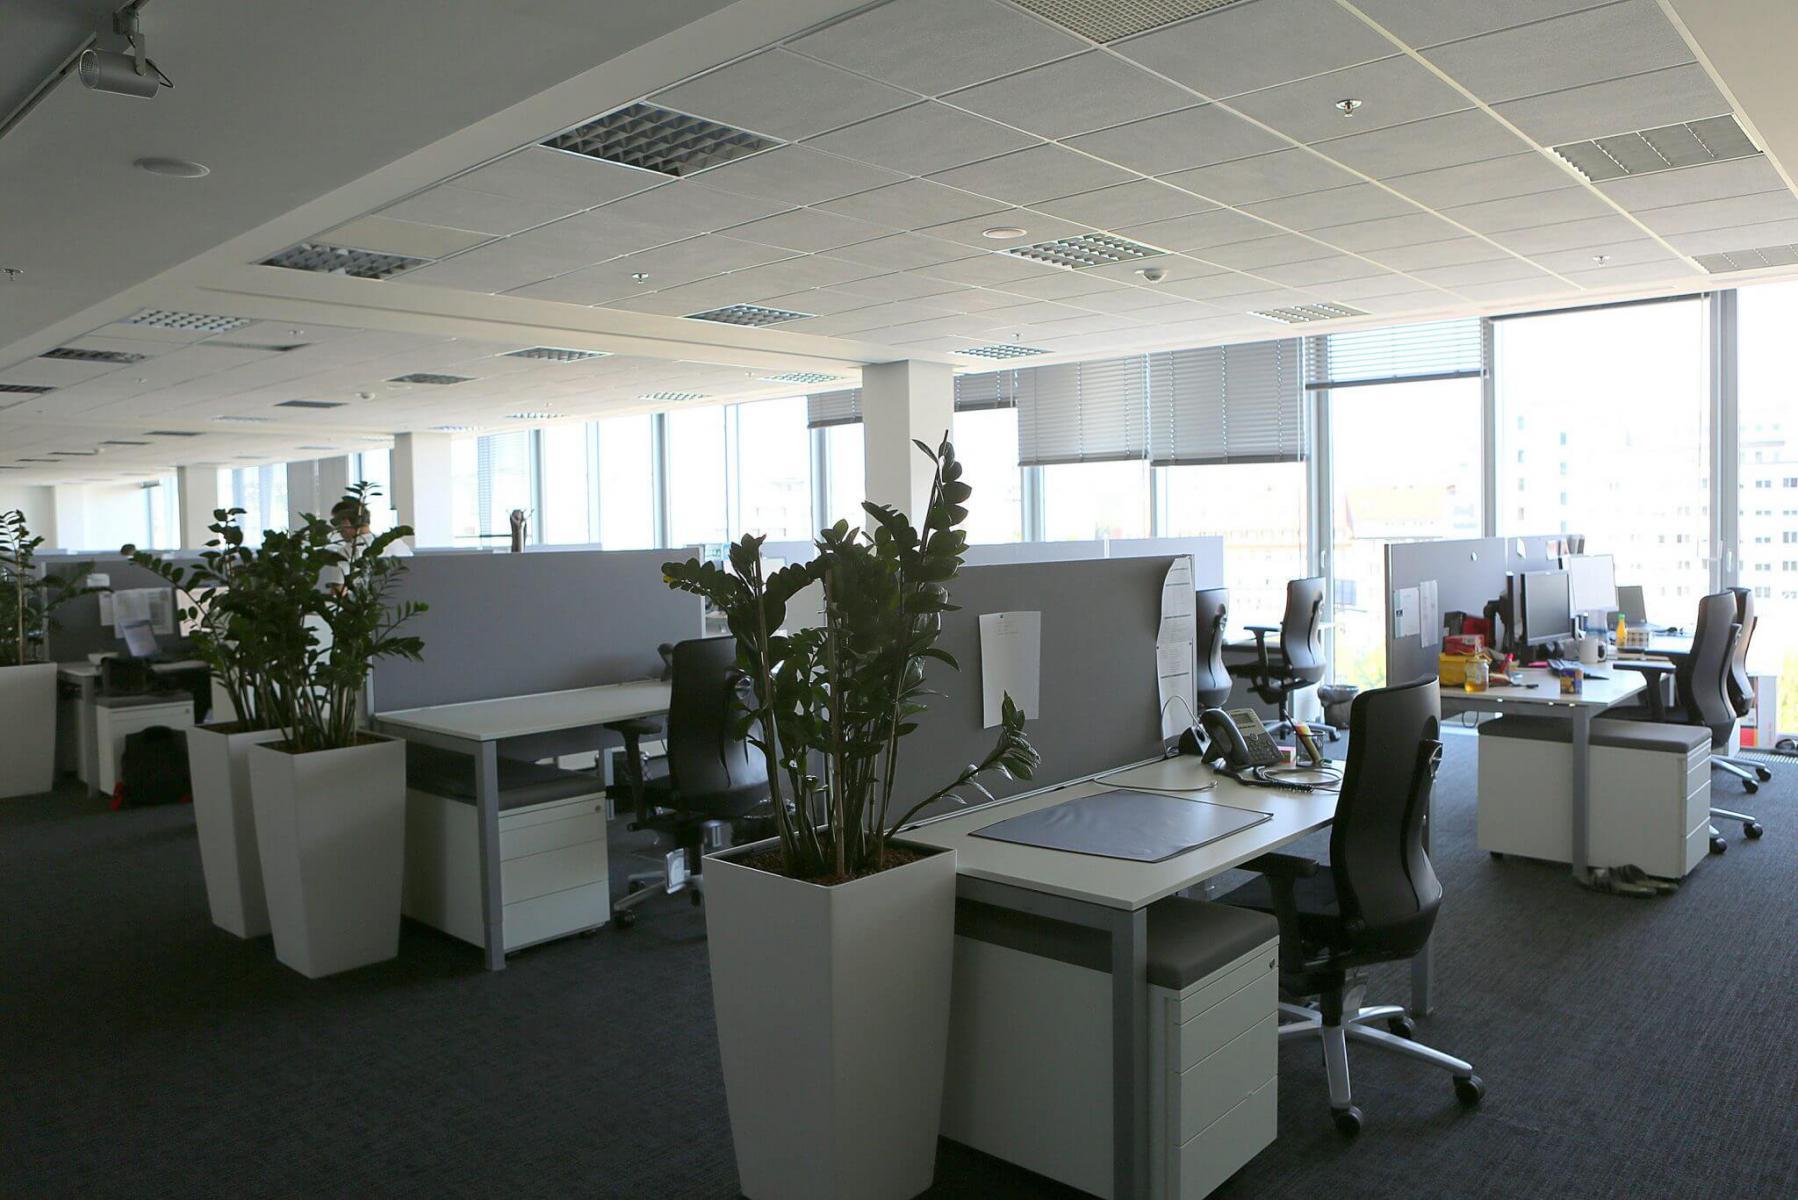 Kancelárske interiéry - Linde Global IT Services Bratislava